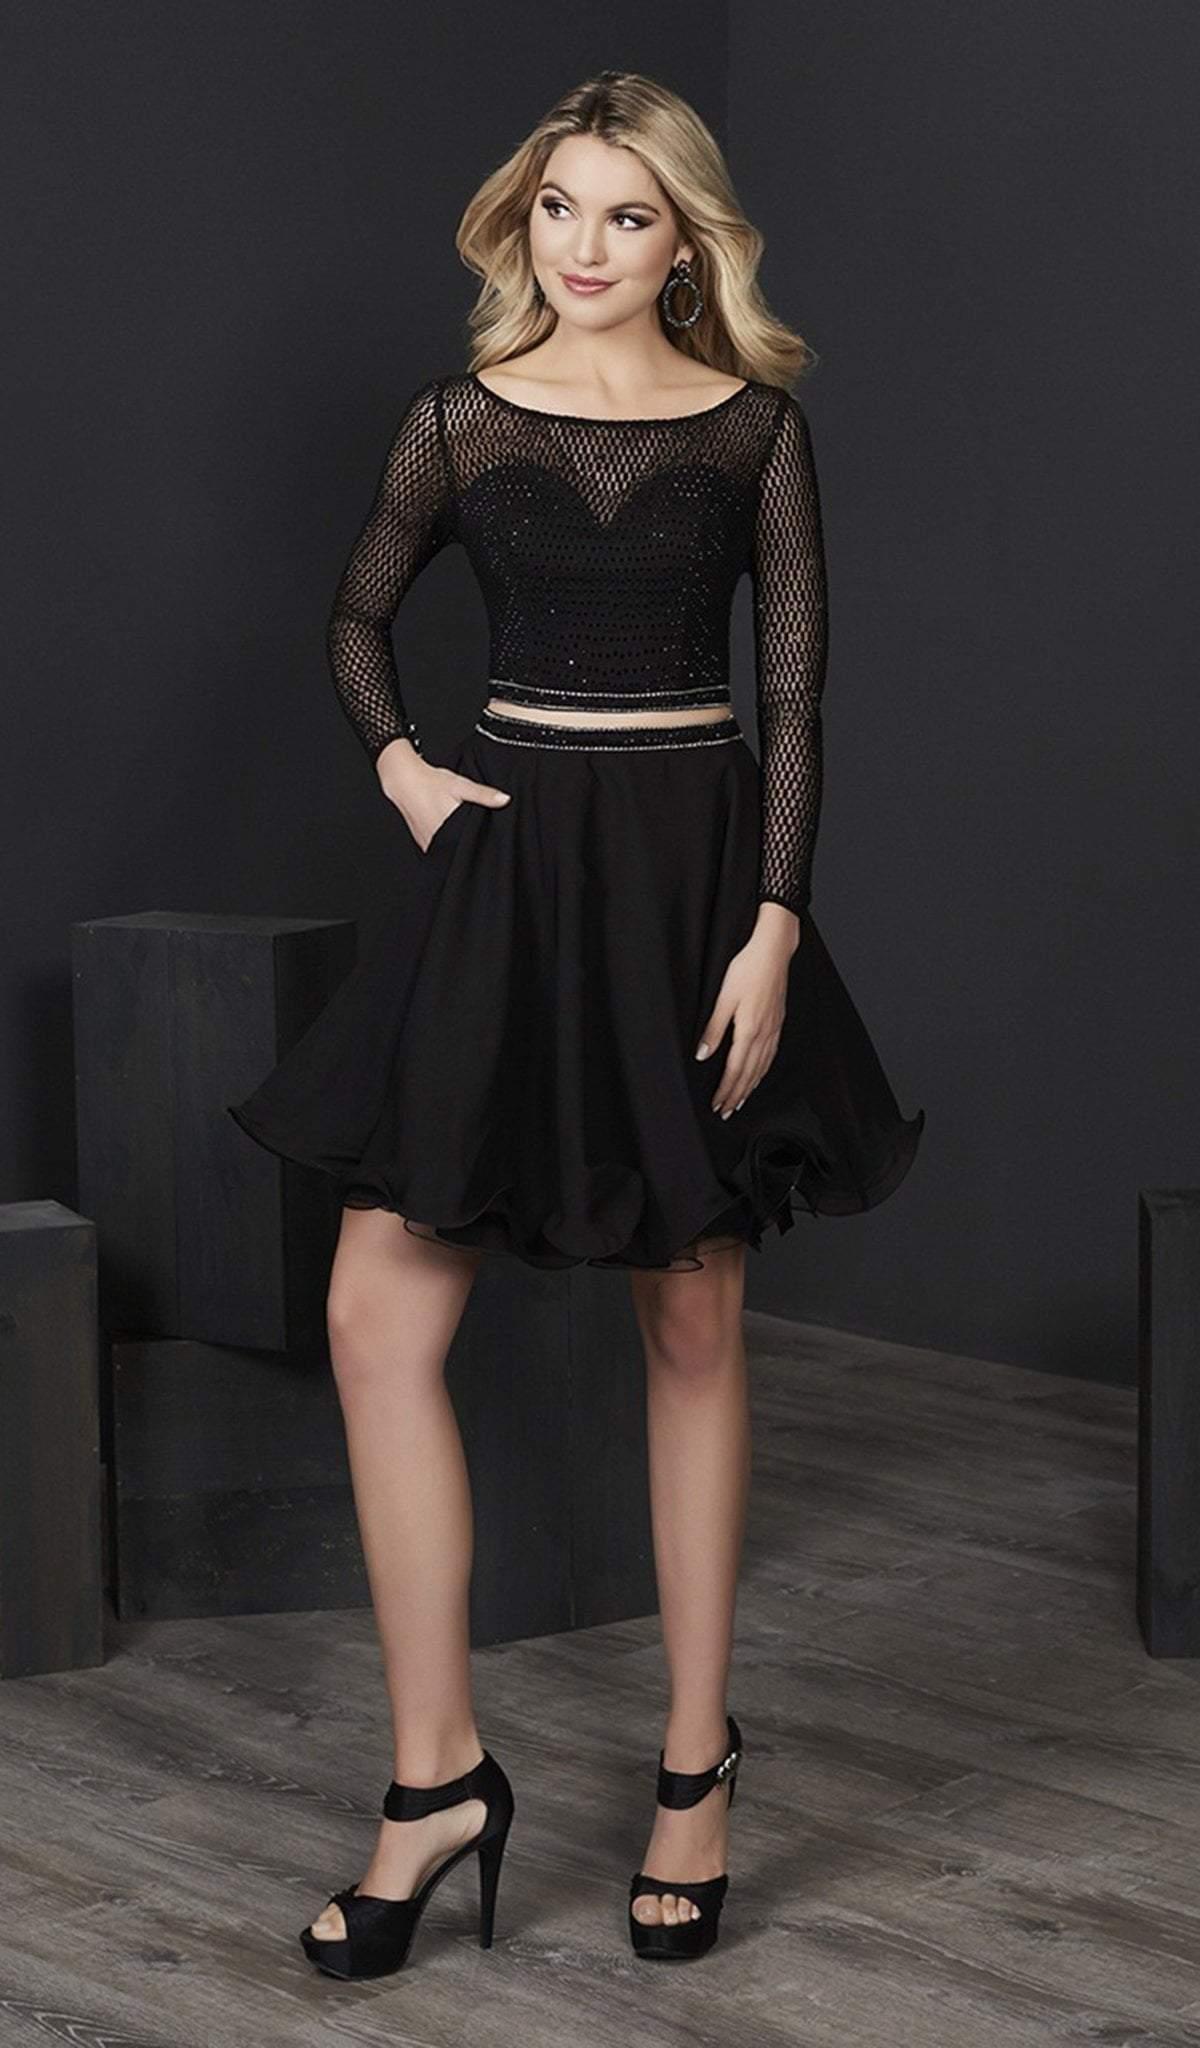 Tiffany Homecoming - 27232 Long Sleeve Sheer Lattice Two-Piece Dress